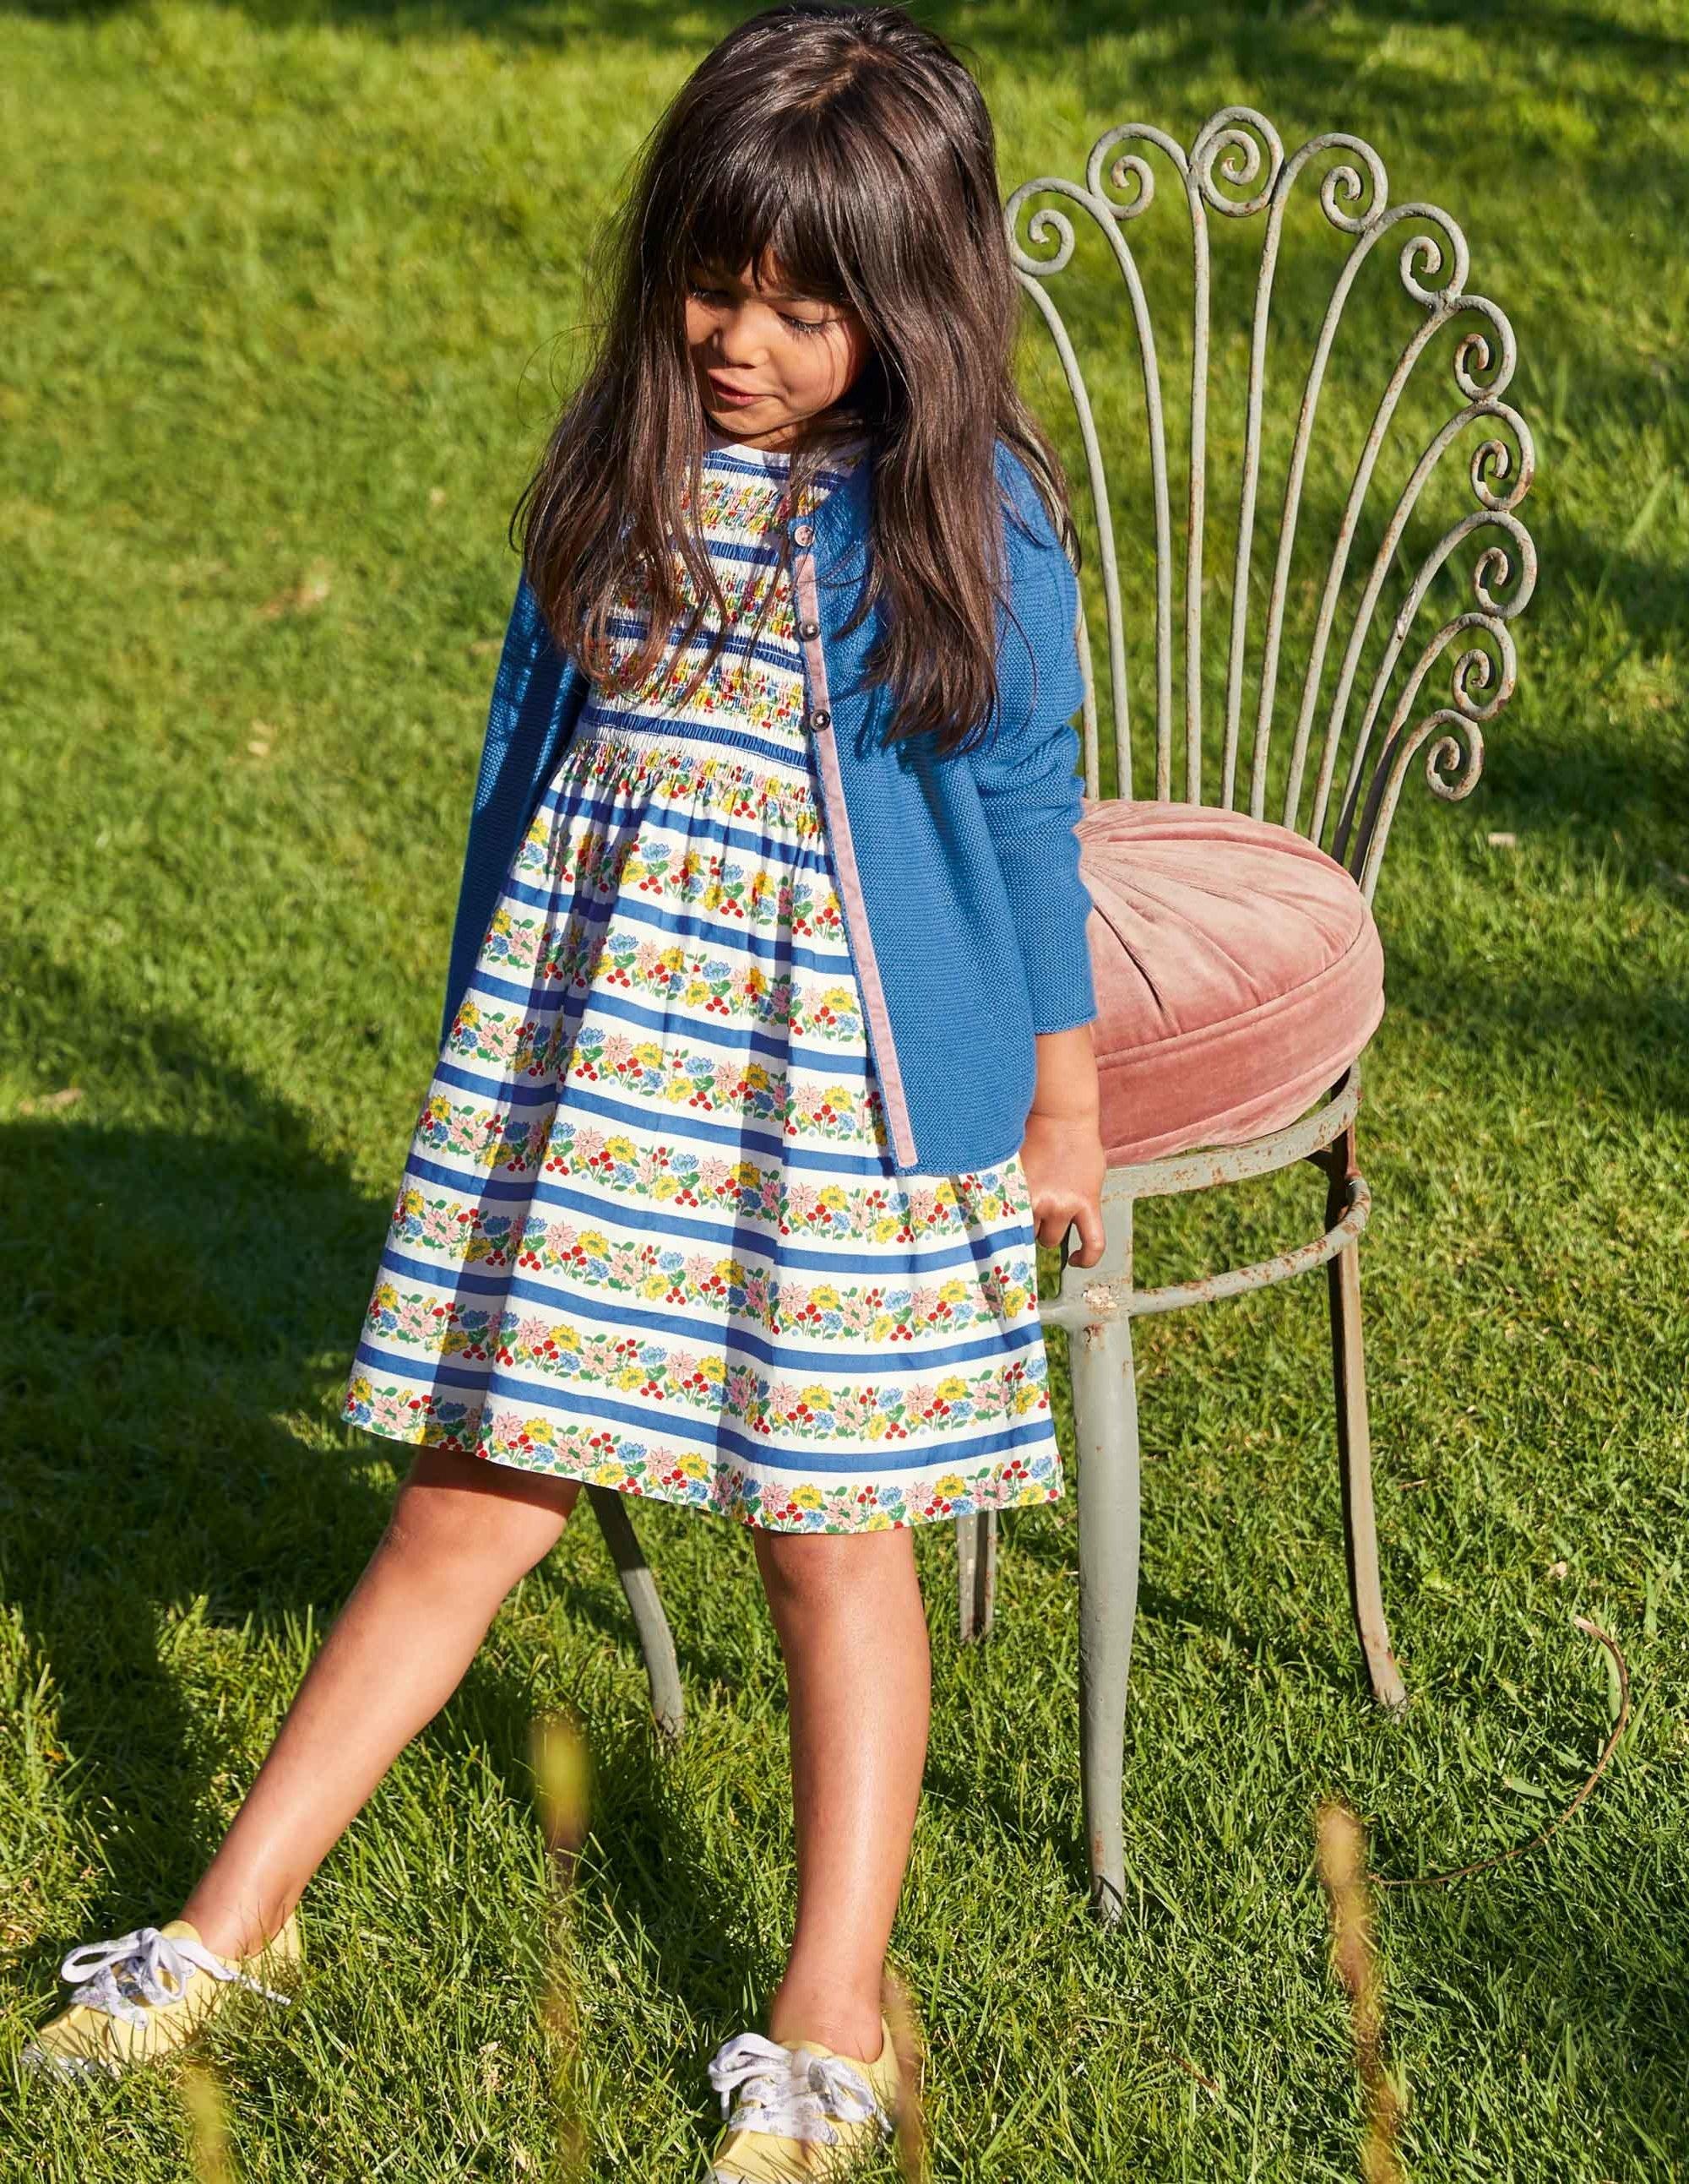 Boden Smocked Woven Dress - Multi Floral Stripe